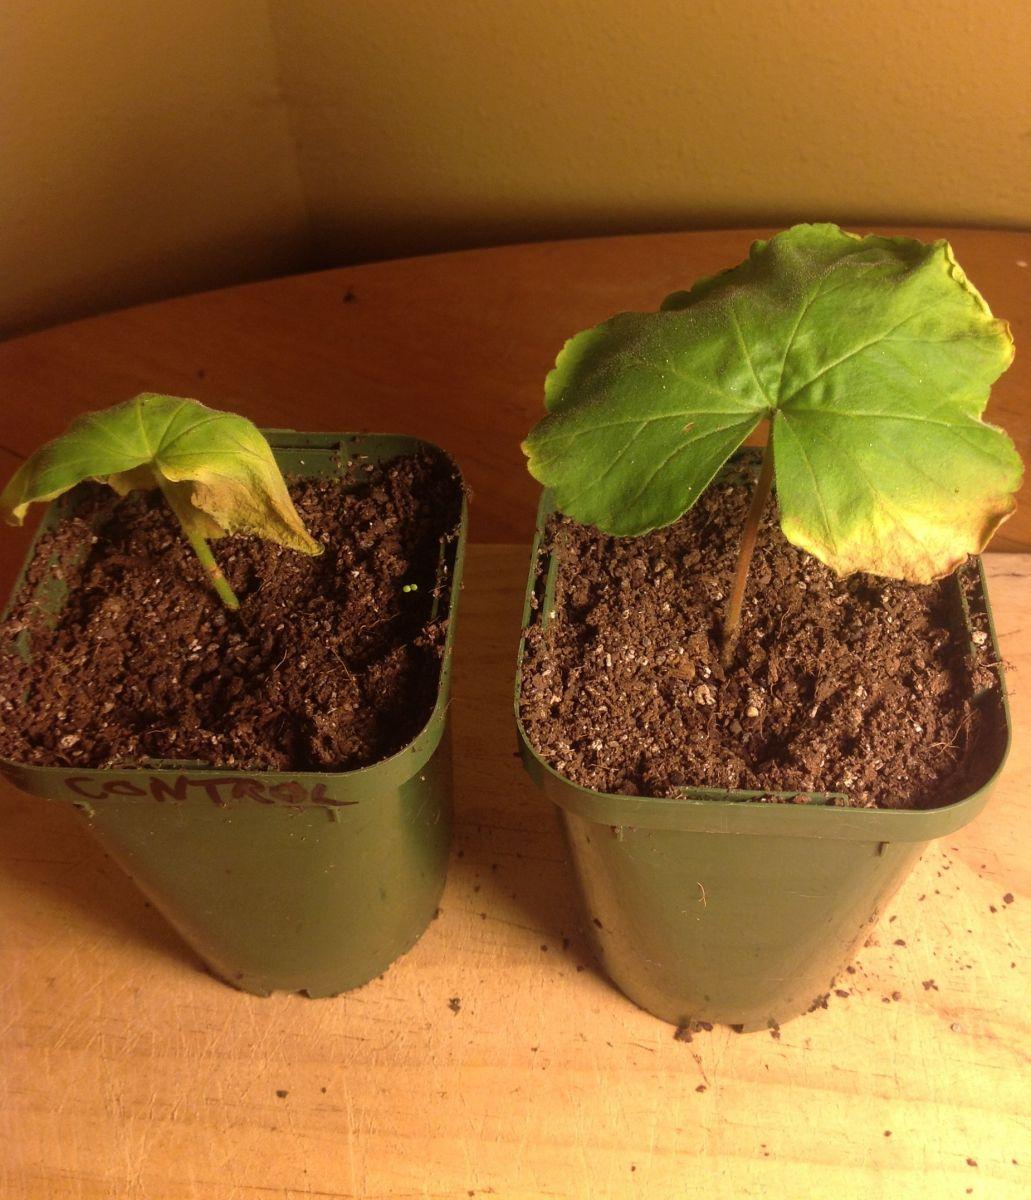 Leaf healing experiment